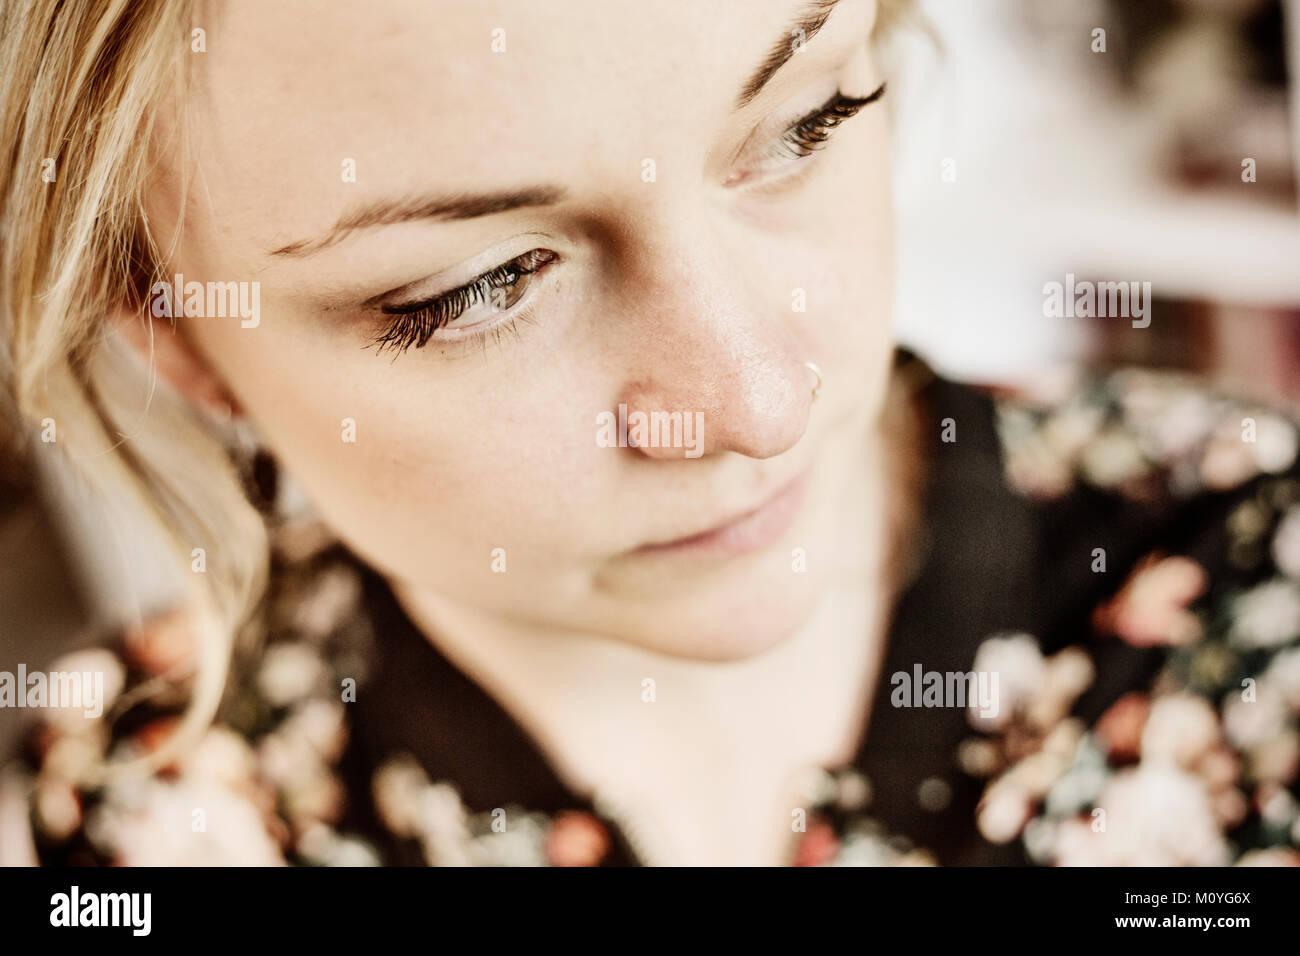 Nose Piercing Stock Photos & Nose Piercing Stock Images - Alamy